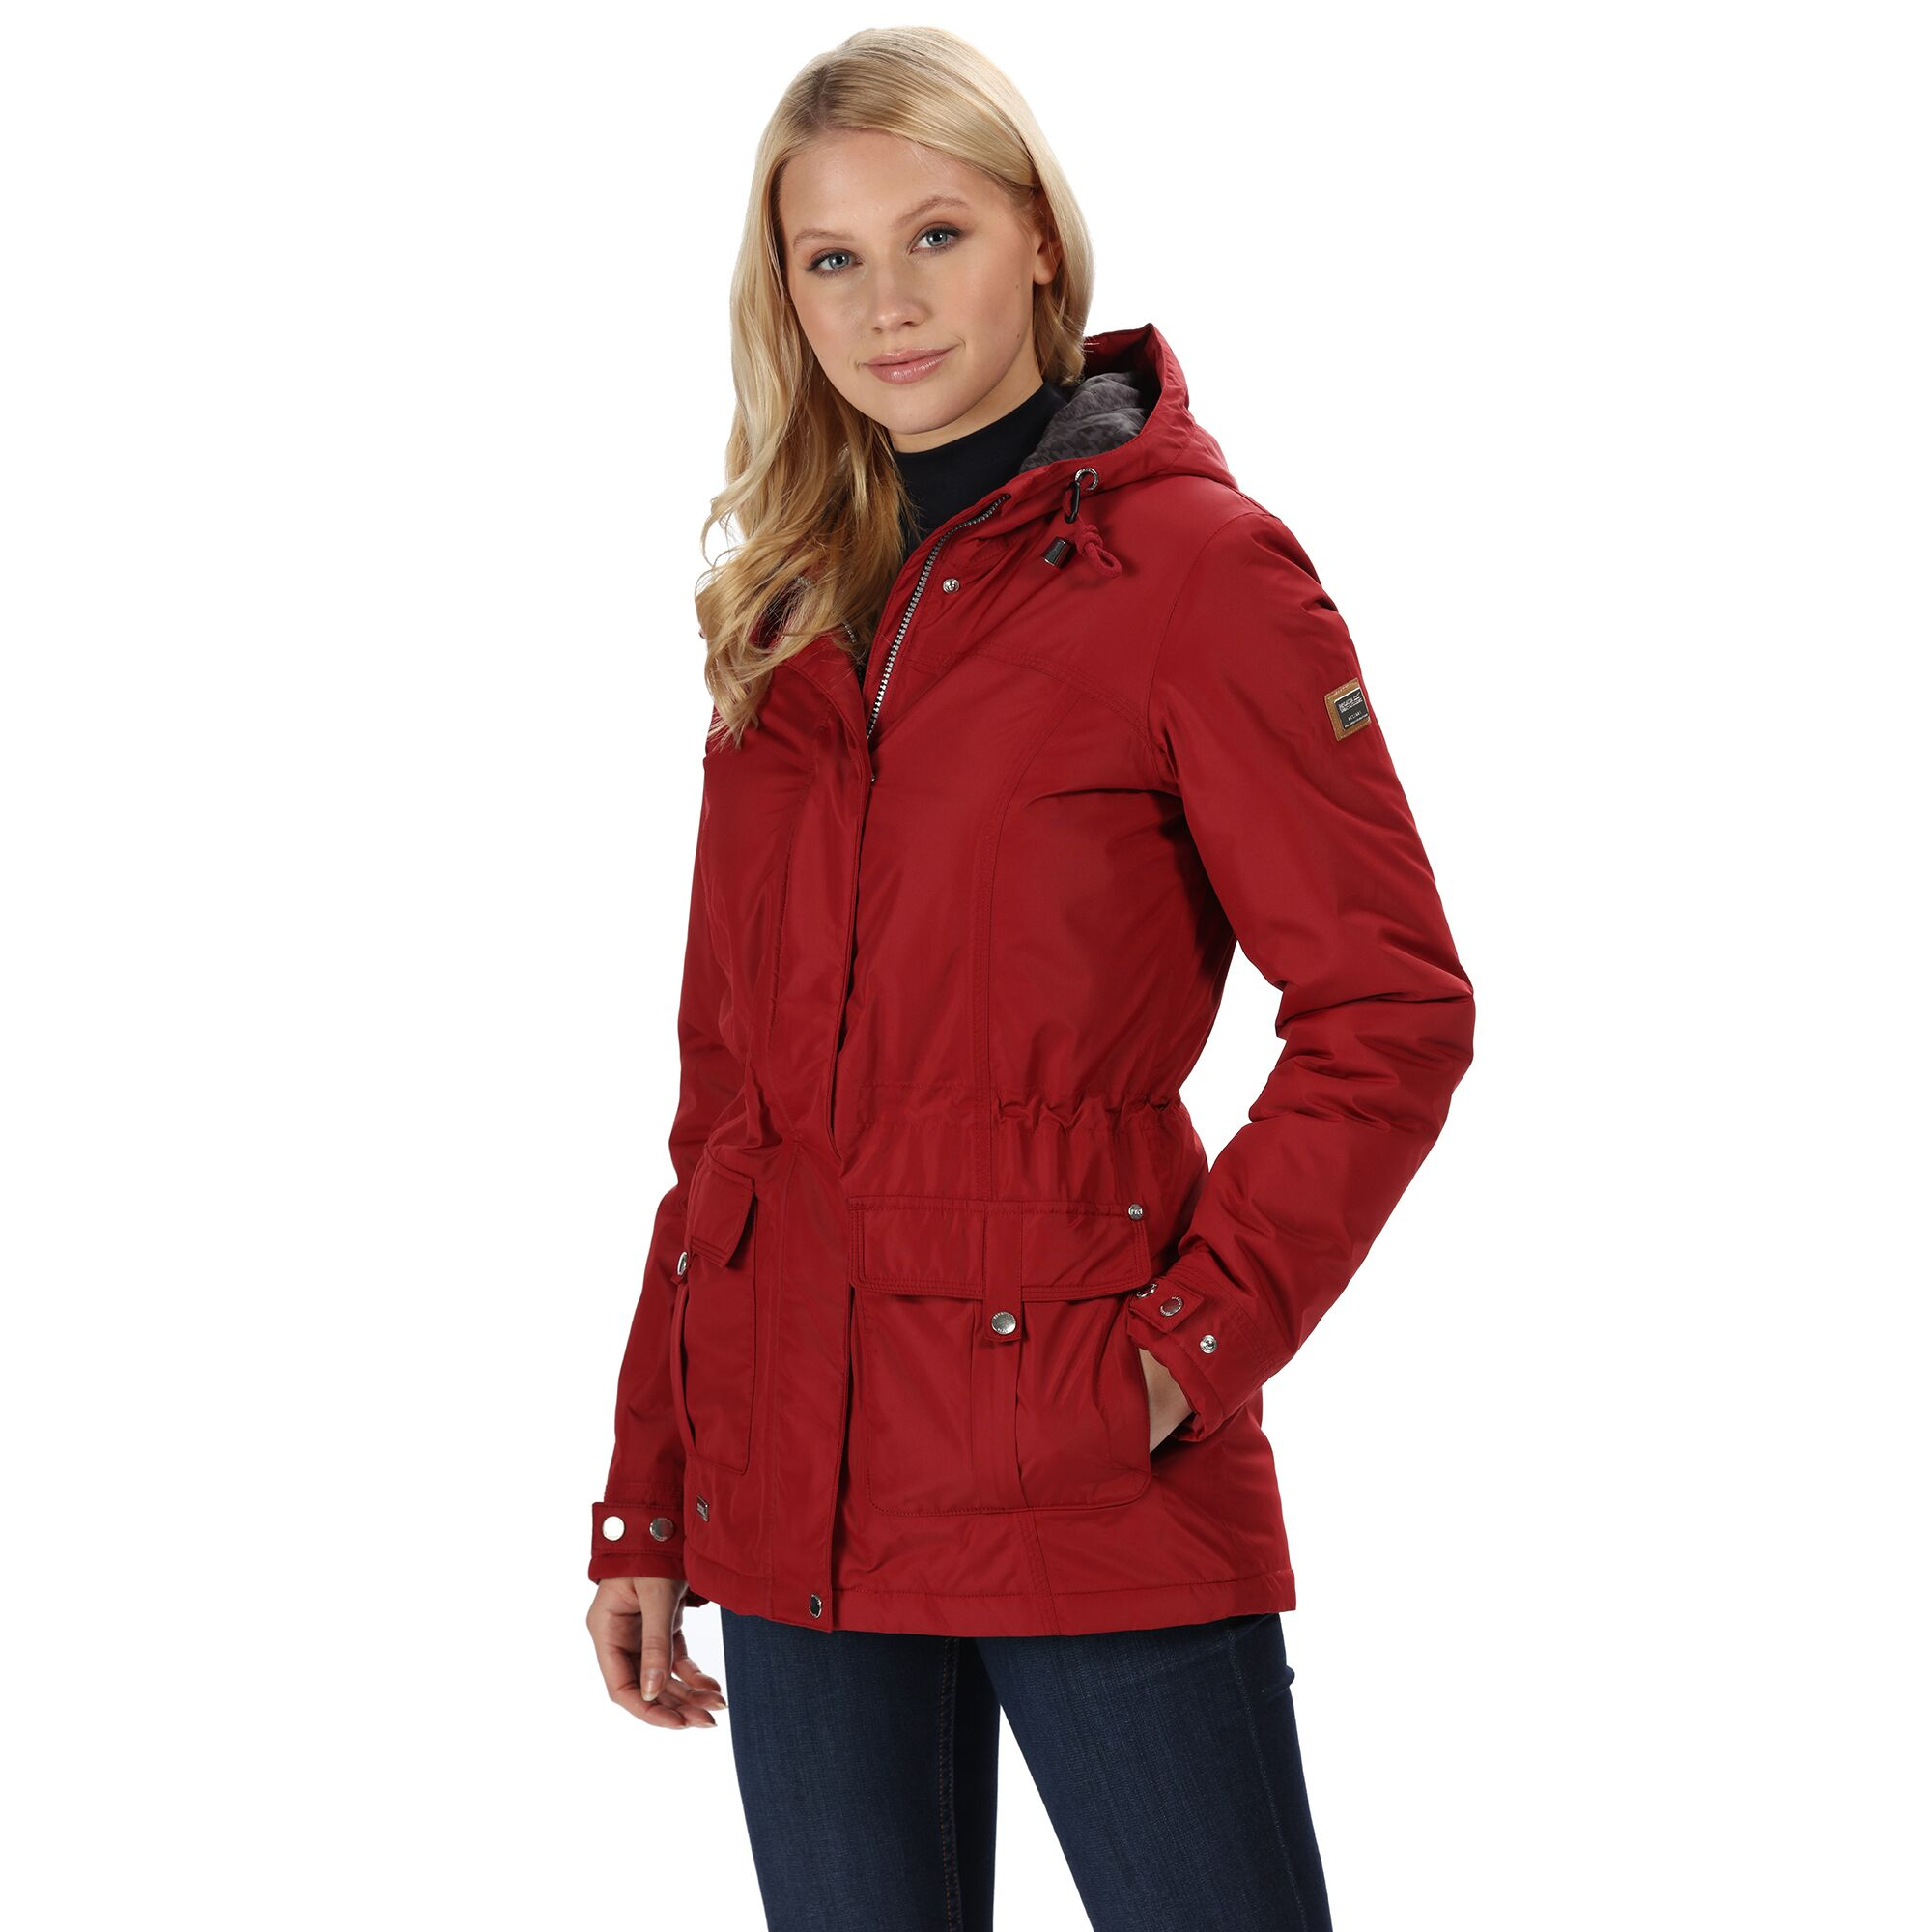 Regatta-Womens-Ladies-Braelynn-Long-Length-Waterproof-Jacket-RG4552 thumbnail 10